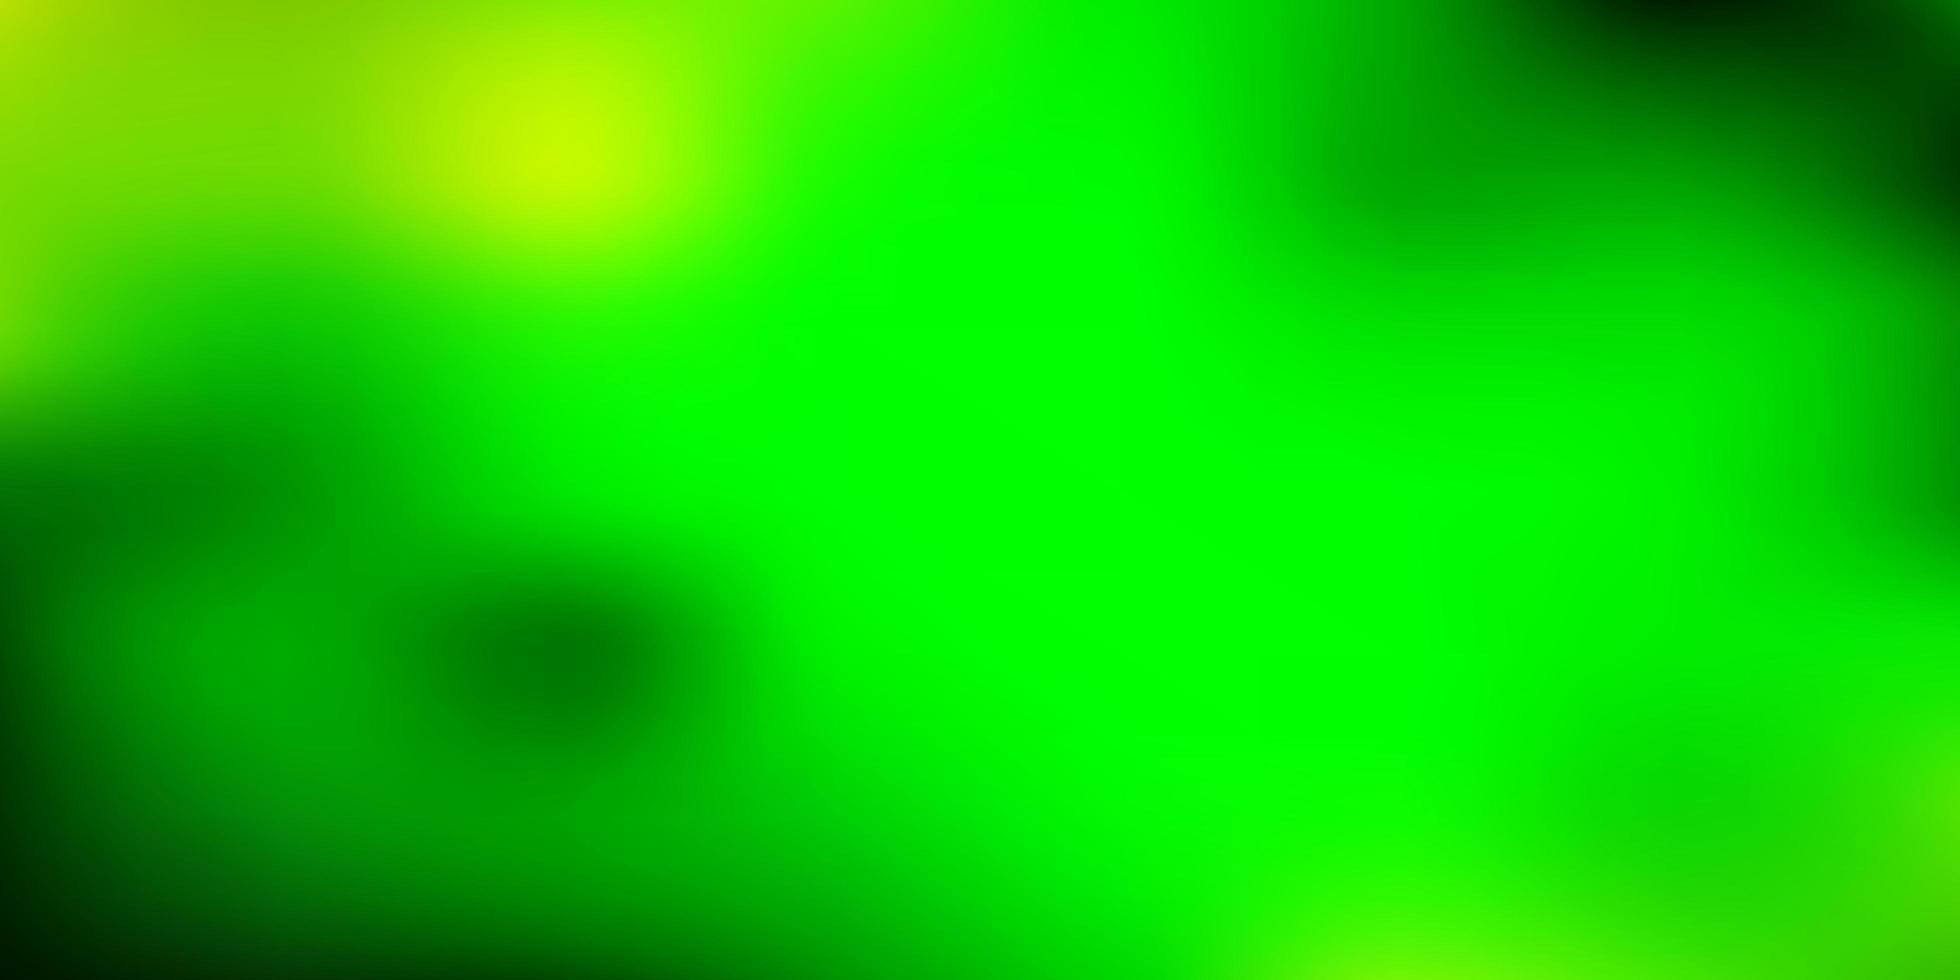 fundo de borrão abstrato do vetor azul escuro e verde.